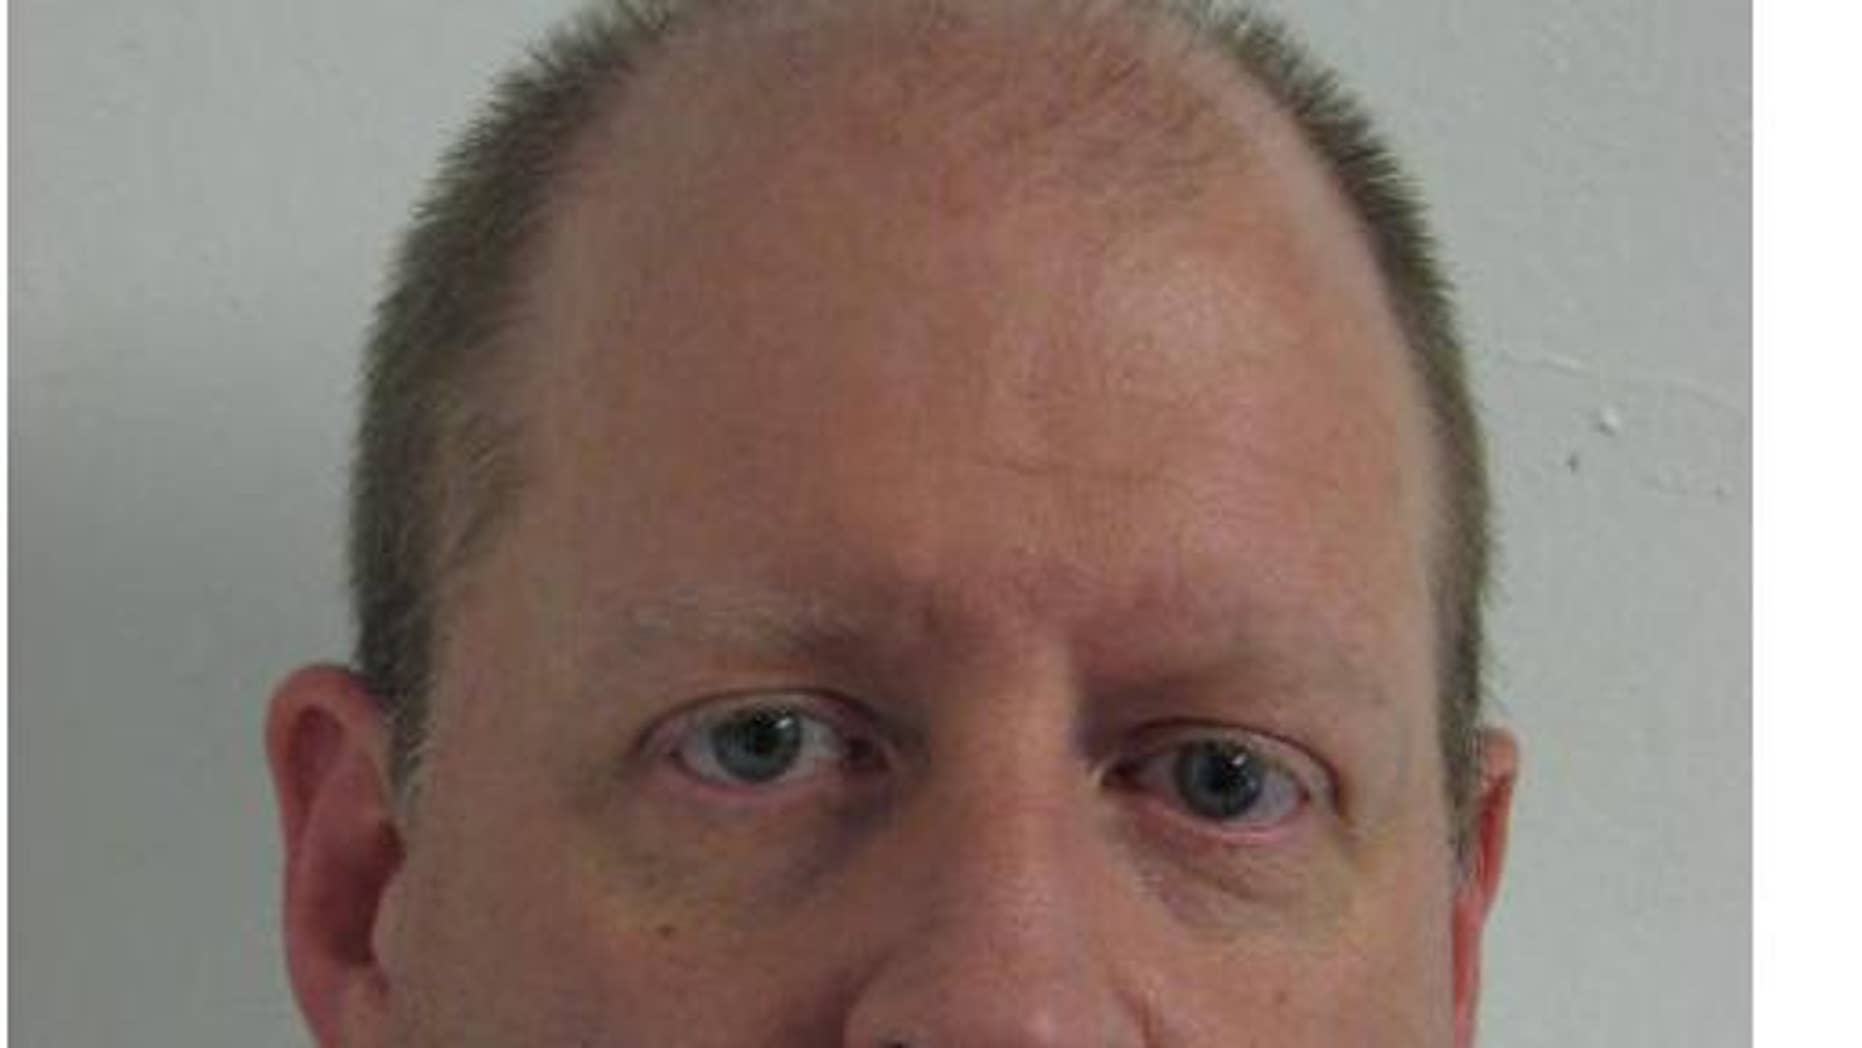 Bob Decheine was arrested November 19 (Gaithersburg, MD Police Mug Shot)